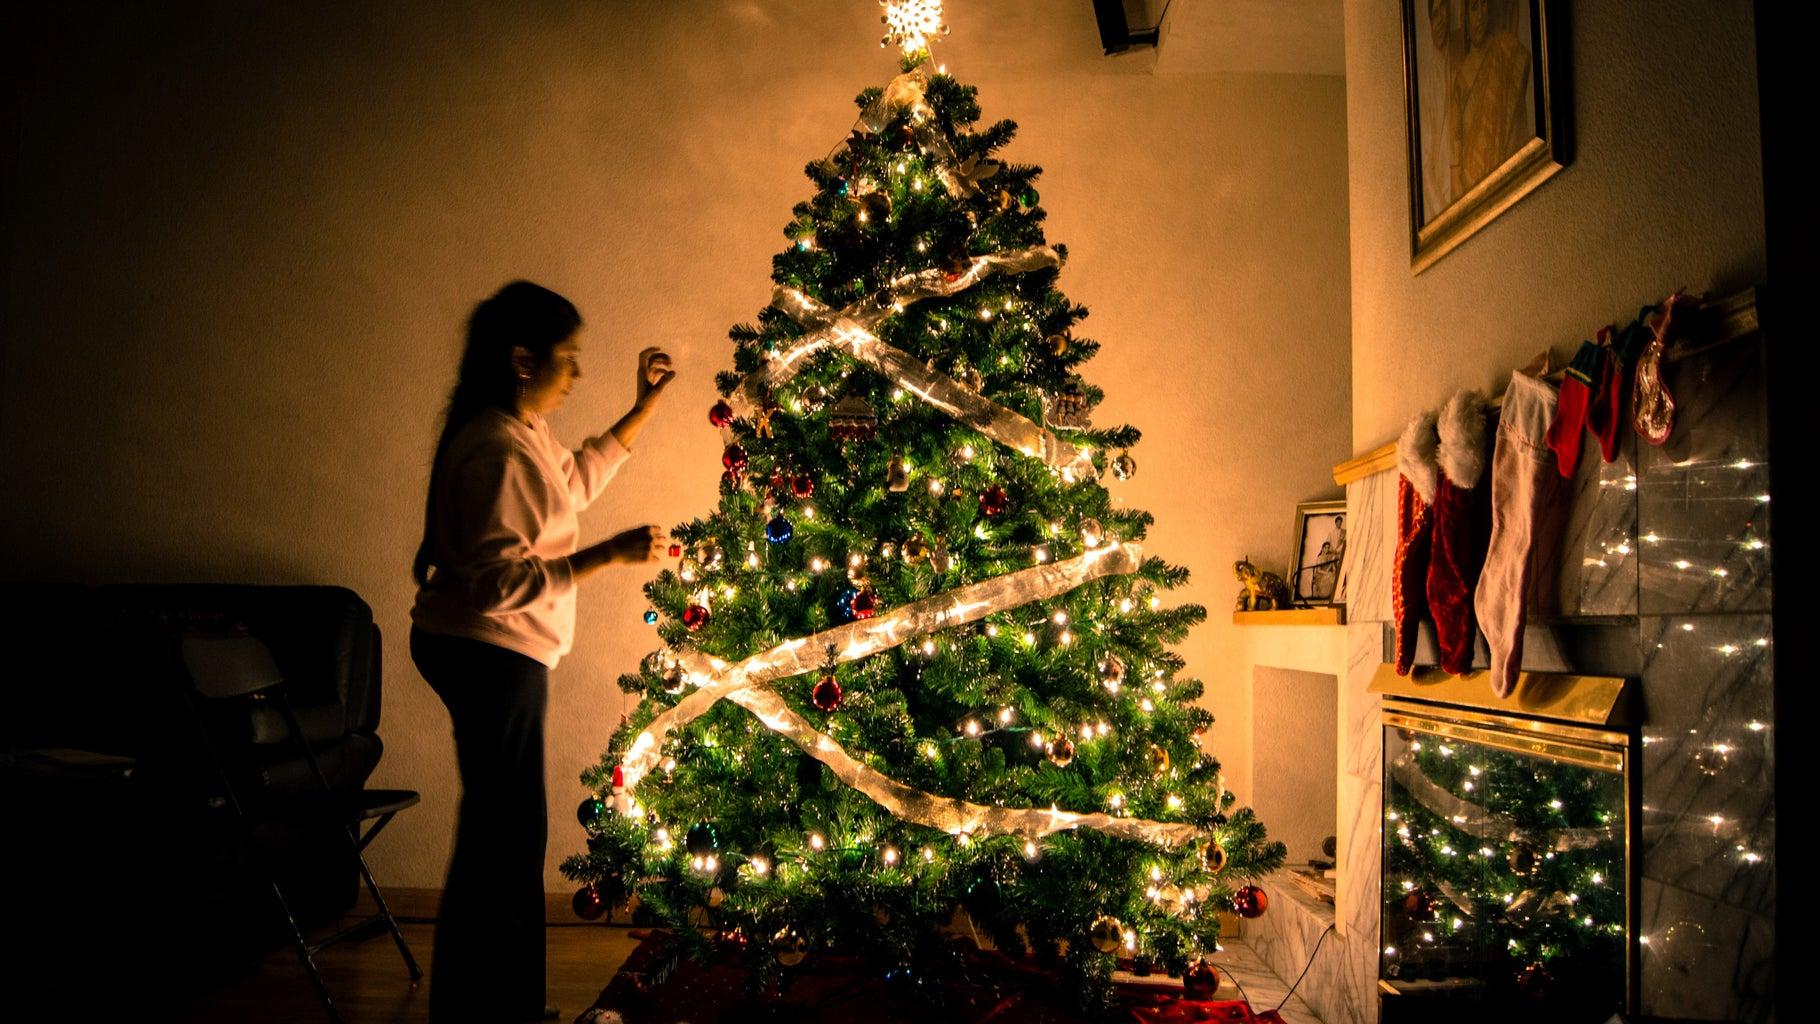 person decorating christmas tree at night